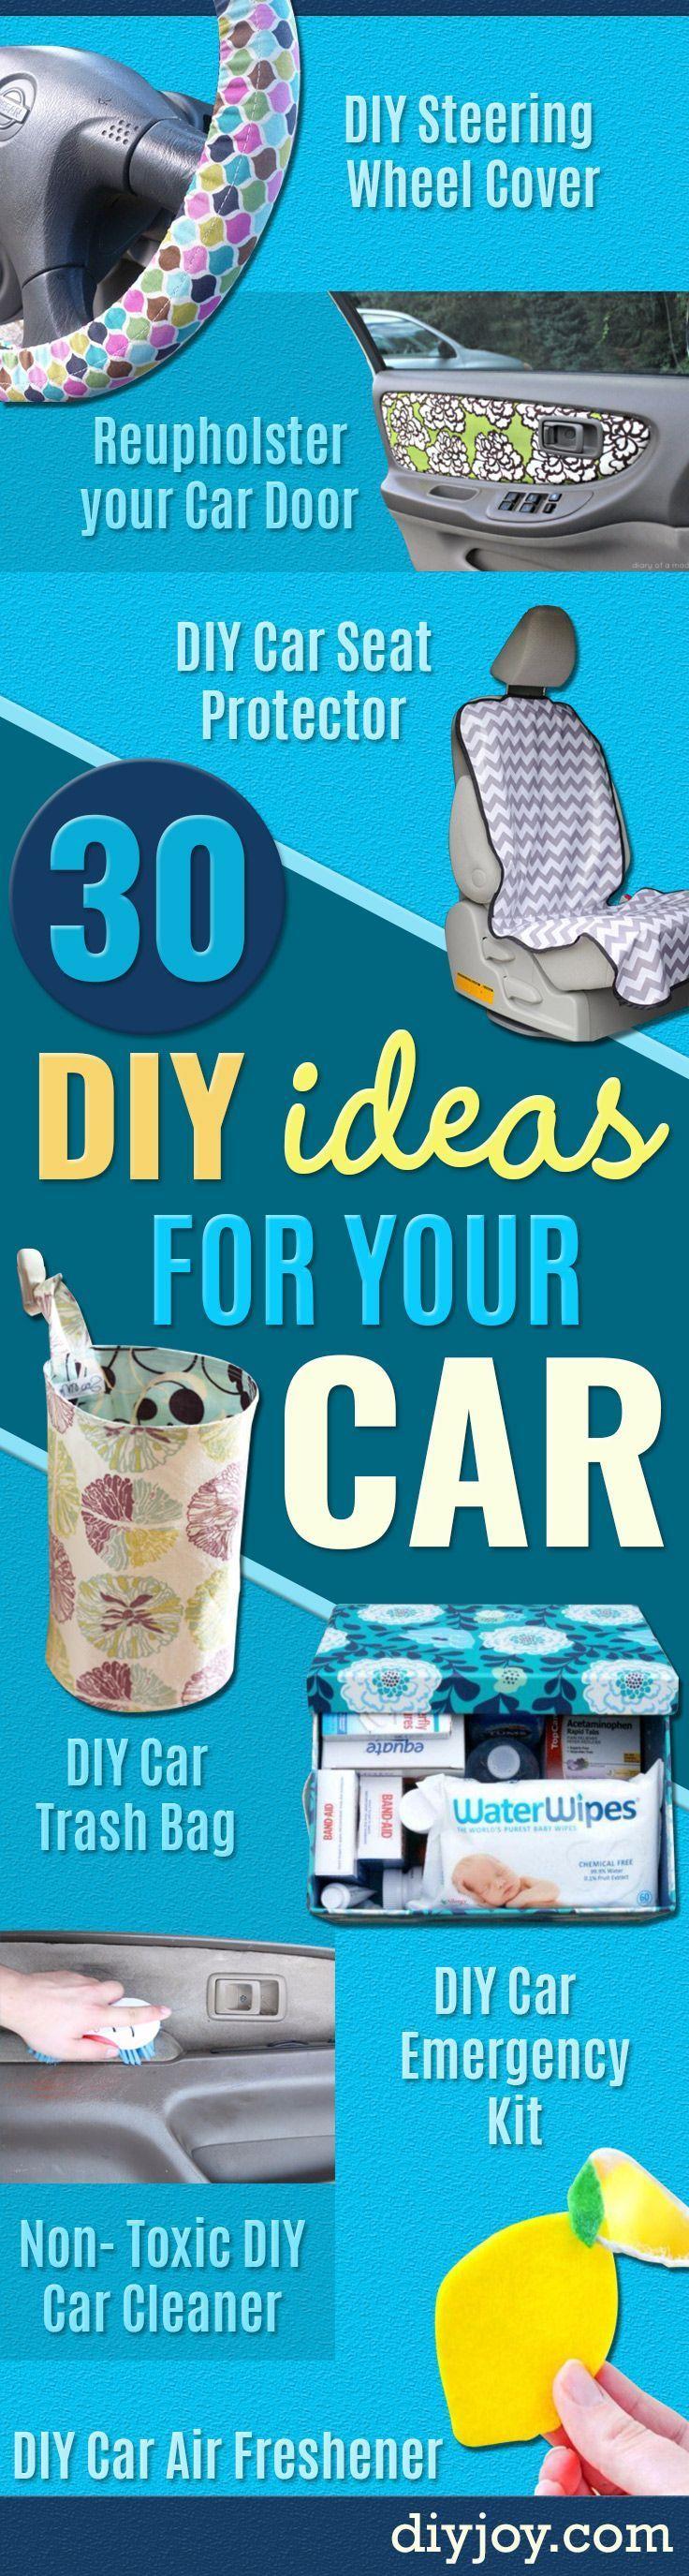 Best 25 Car Interior Decor Ideas On Pinterest Truck Interior Accessories Diy Interior Car